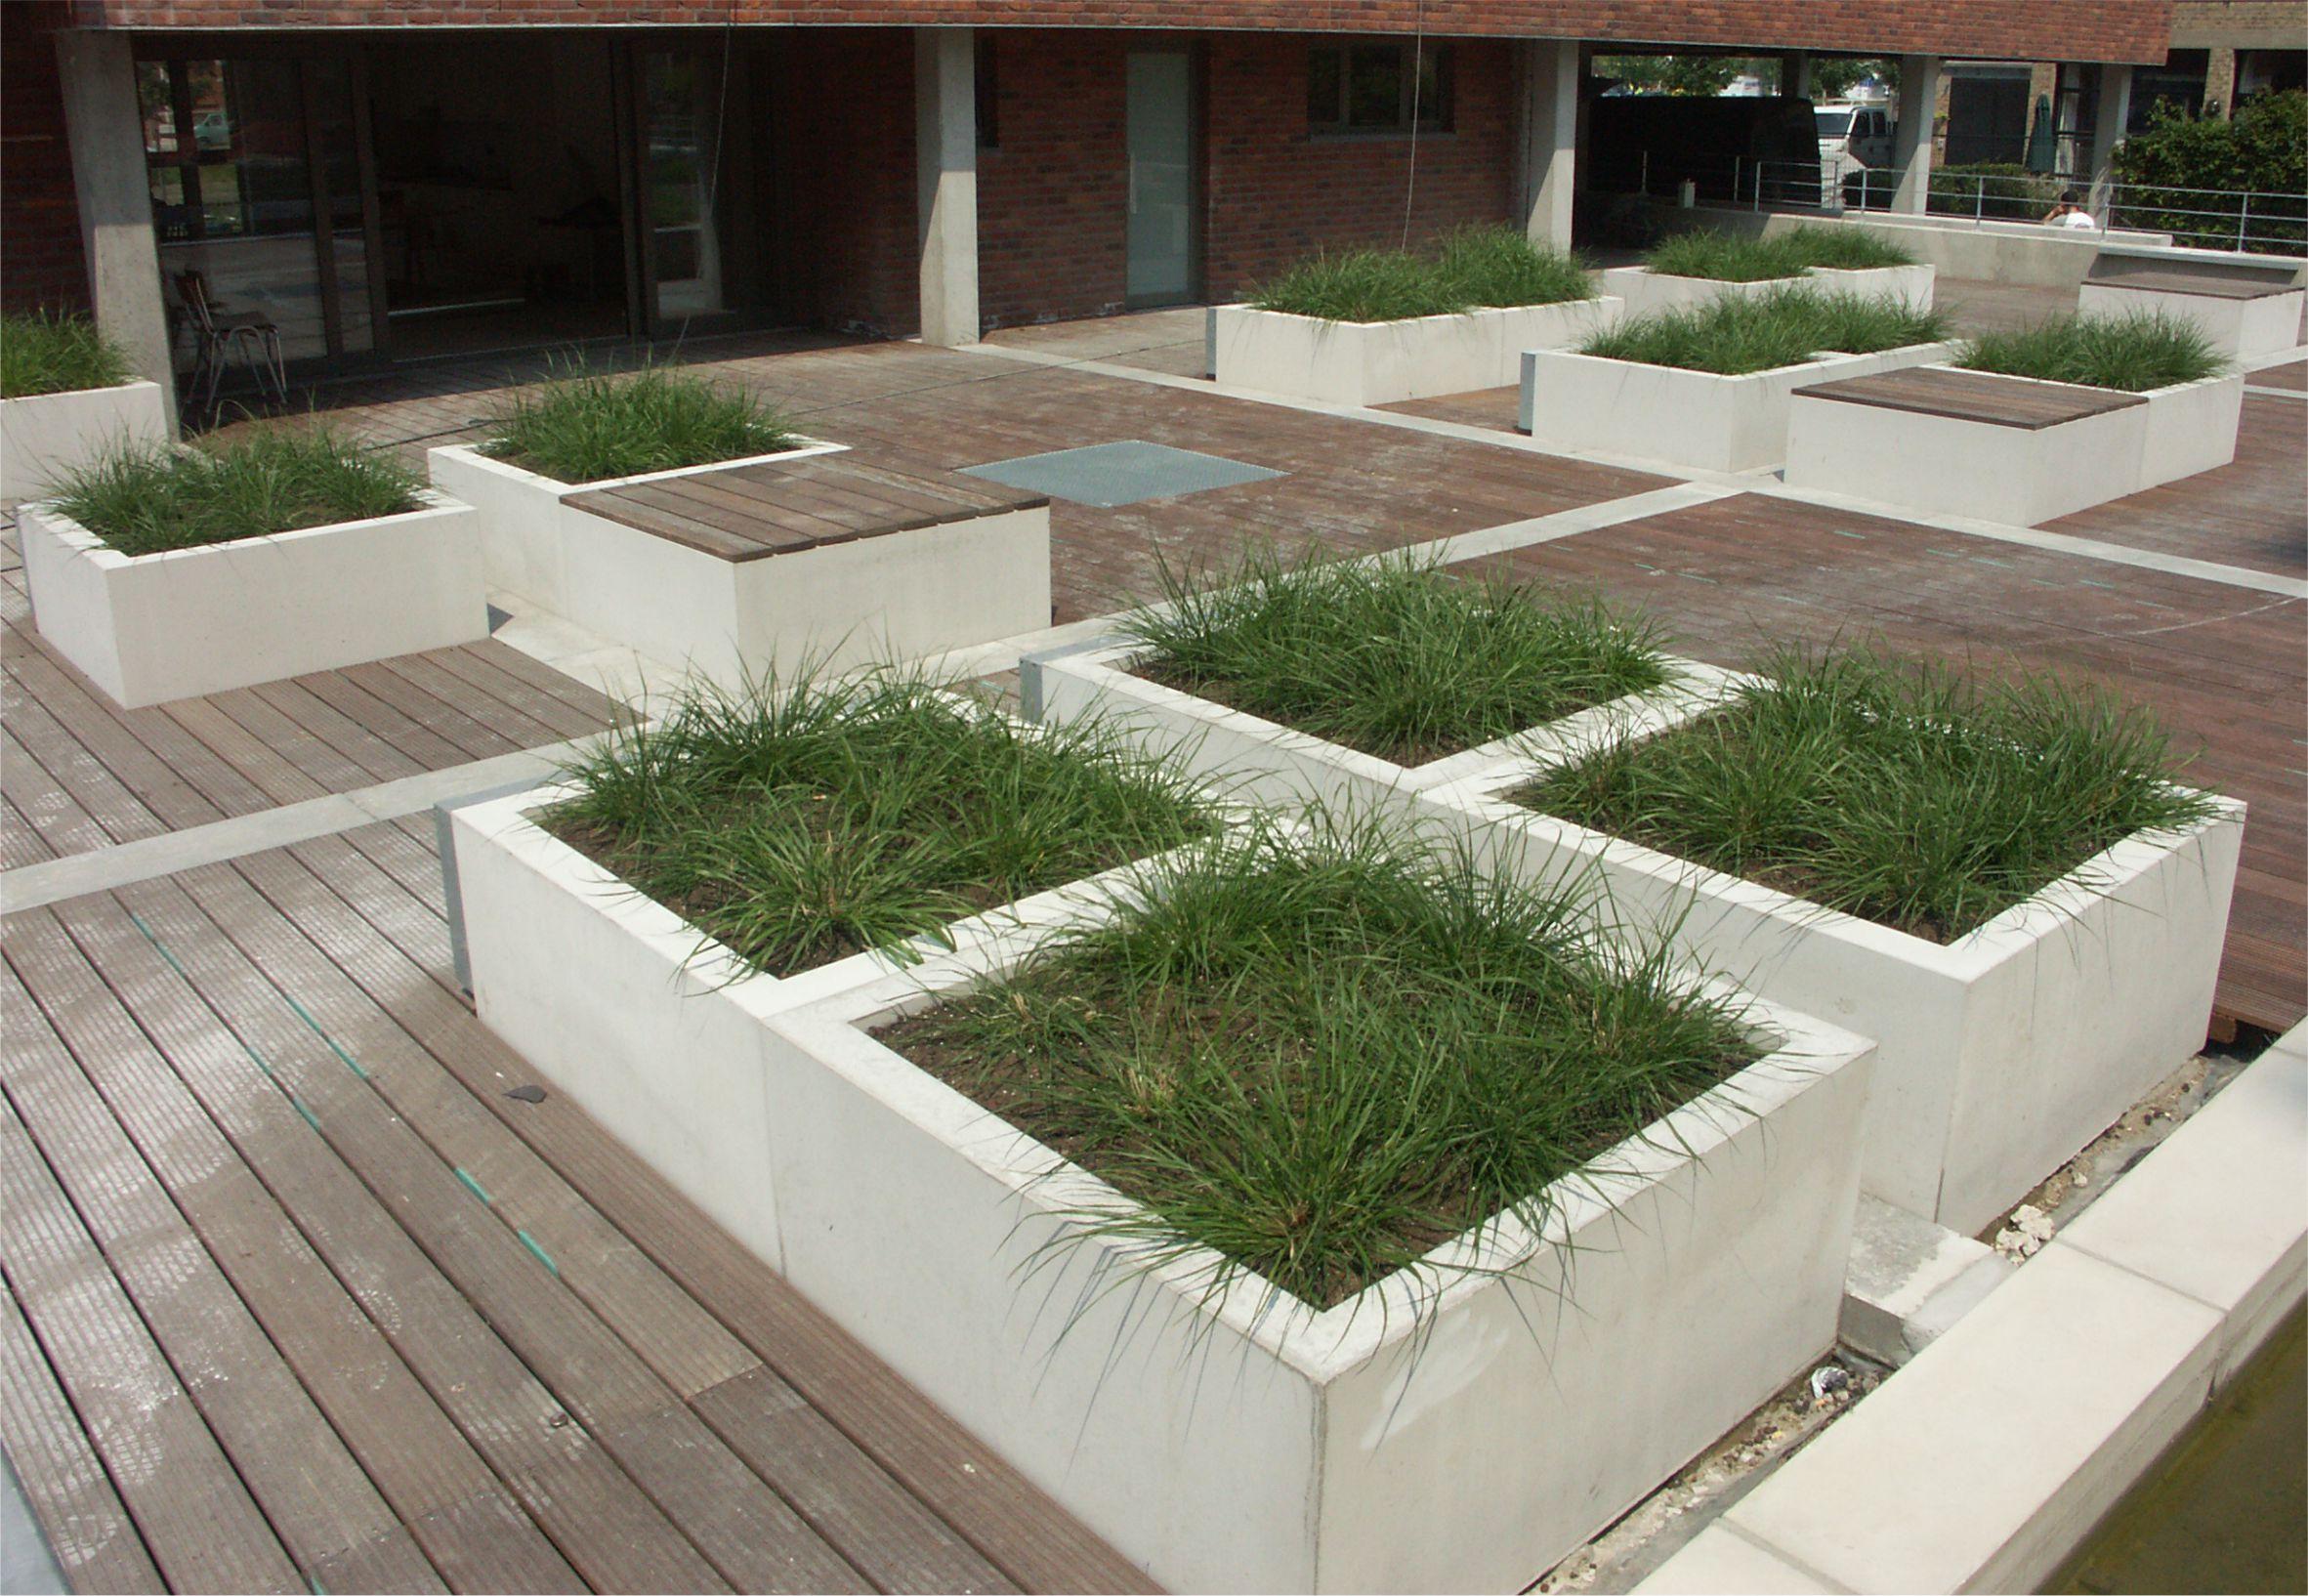 Beton blumentopf modern line for Blumentopf beton